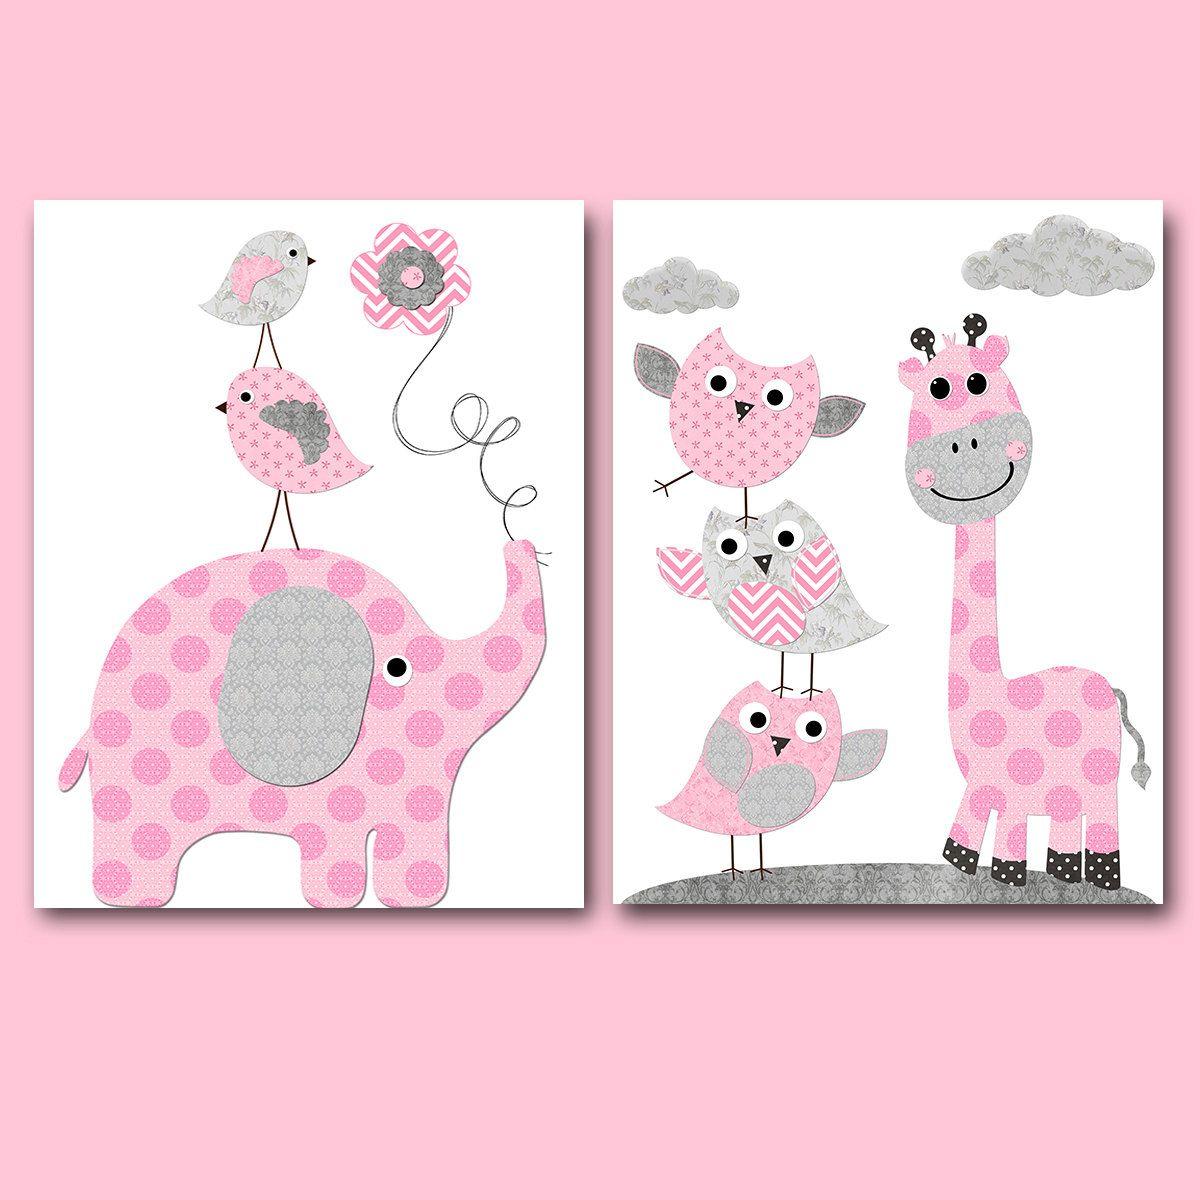 Owl Bedroom Decor Pink Gray Elephant Giraffe Wall Decor Owl Wall Decor Canvas Print